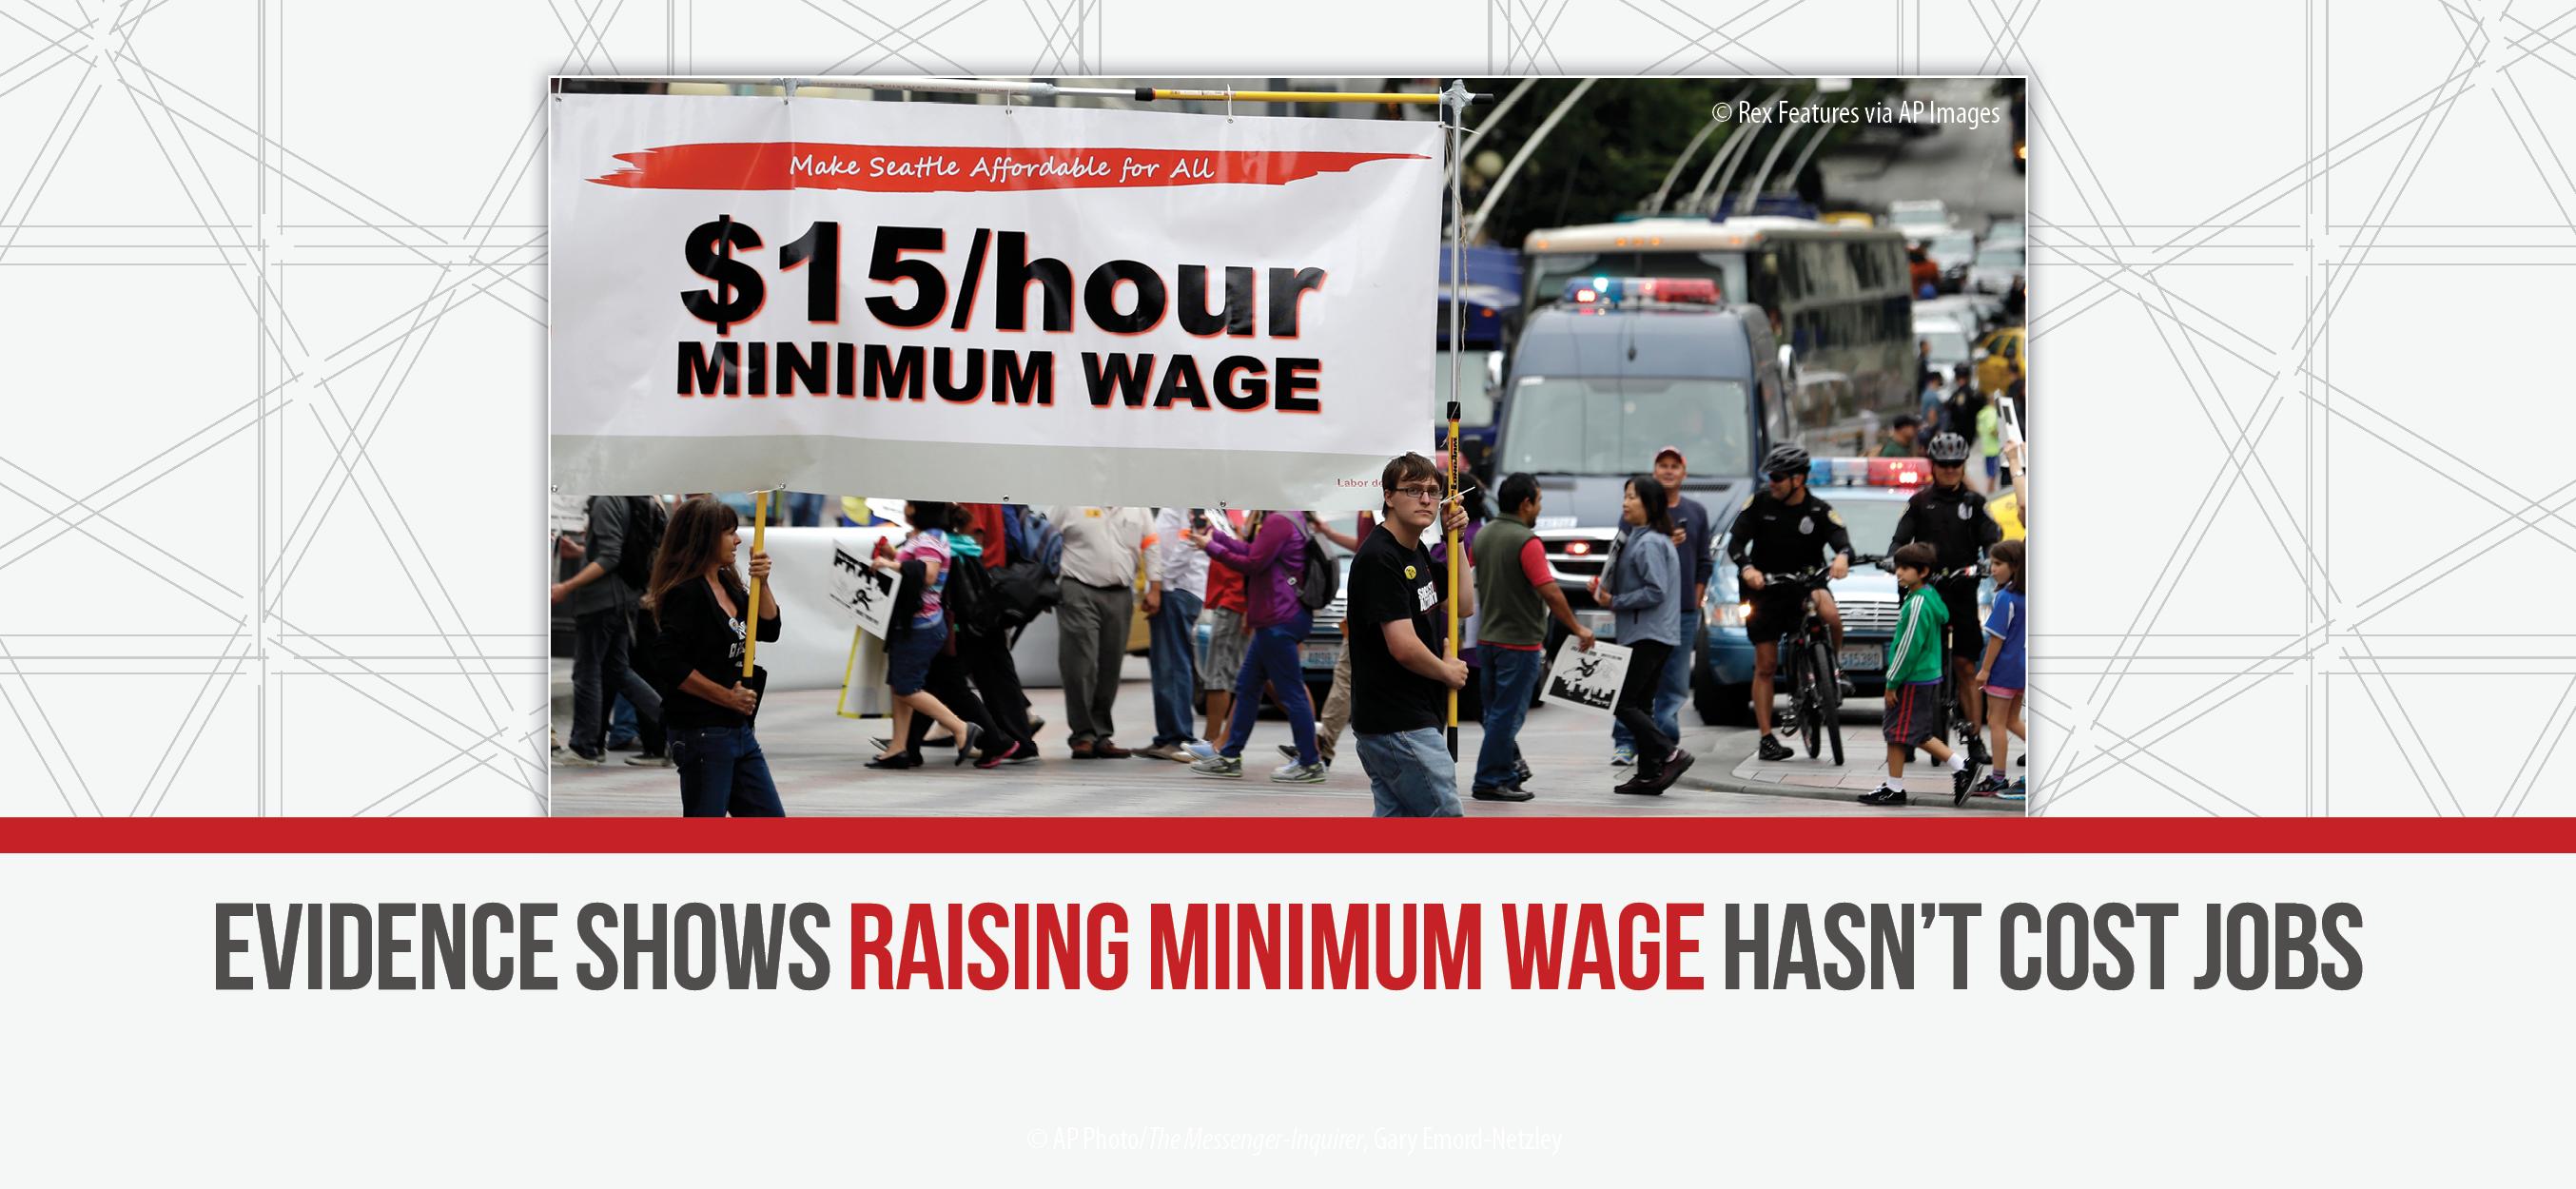 005 Essay On Minimum Wage Example 2014 Mar Apr Images5 Beautiful Argumentative Raising Persuasive Increase Free Full